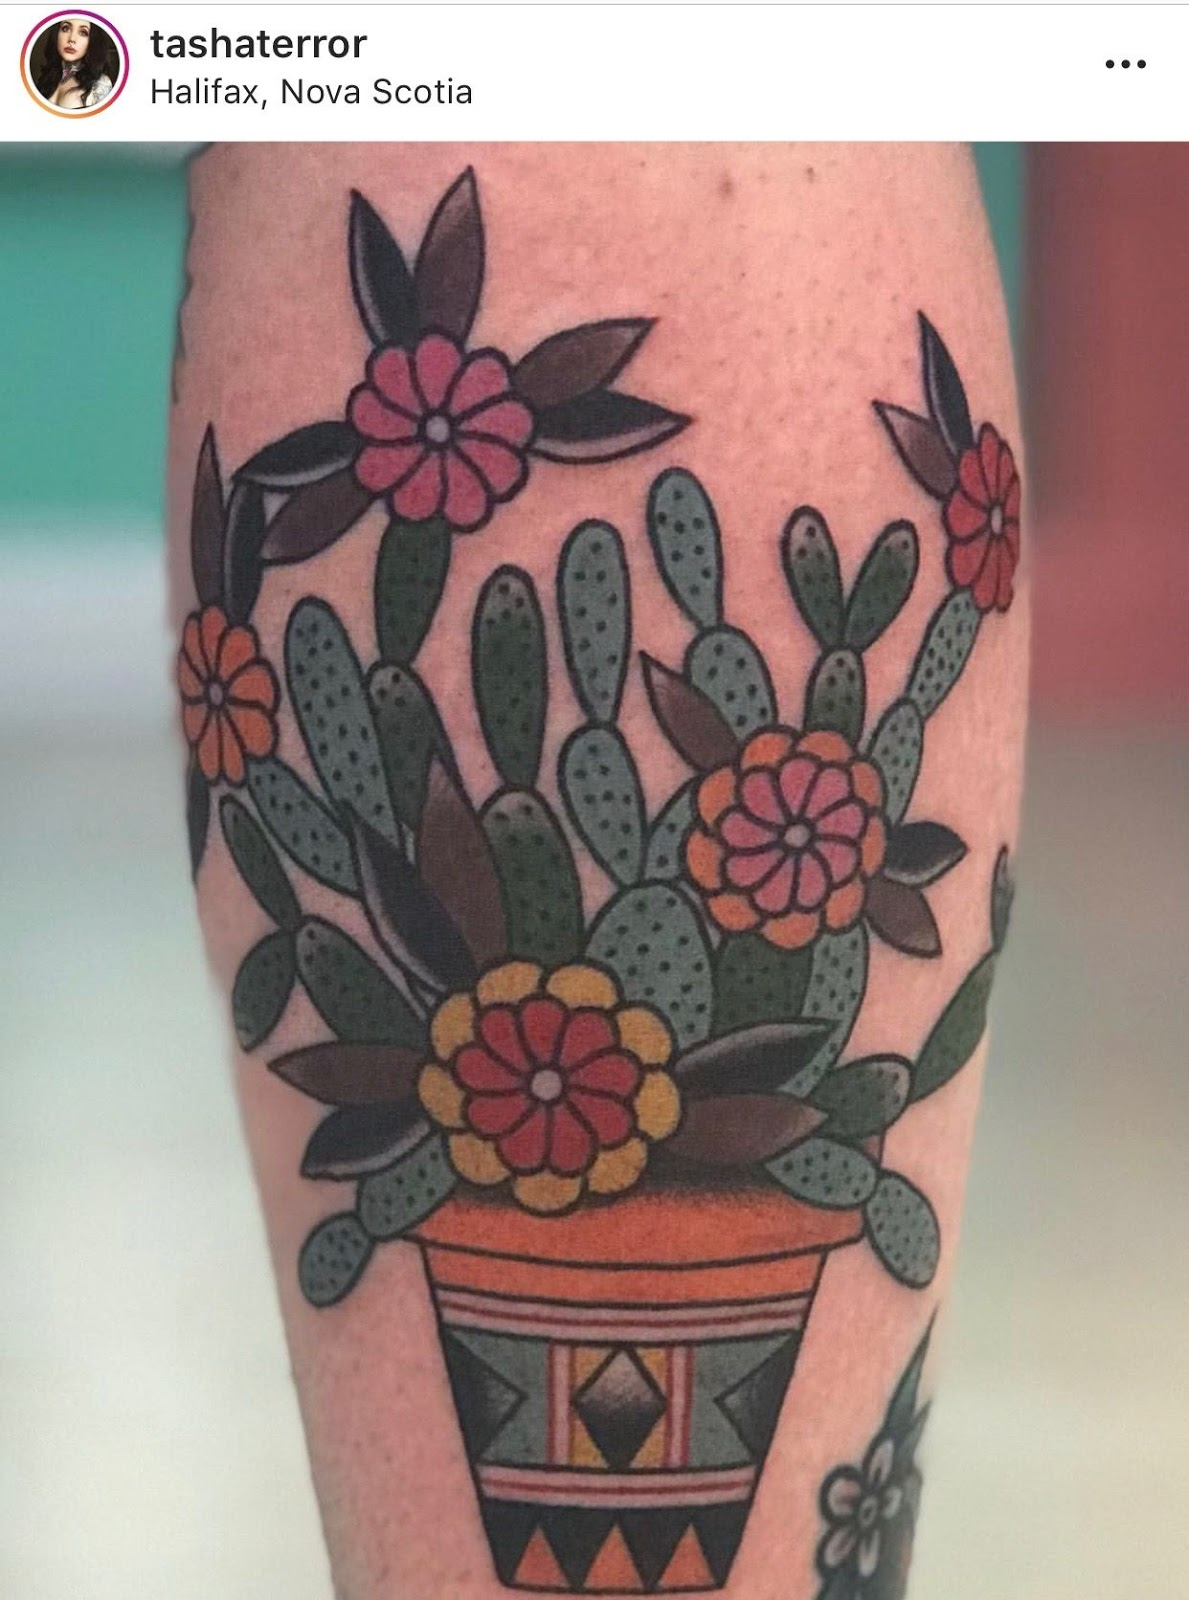 Small Simple Cactus Tattoo Designs (83)